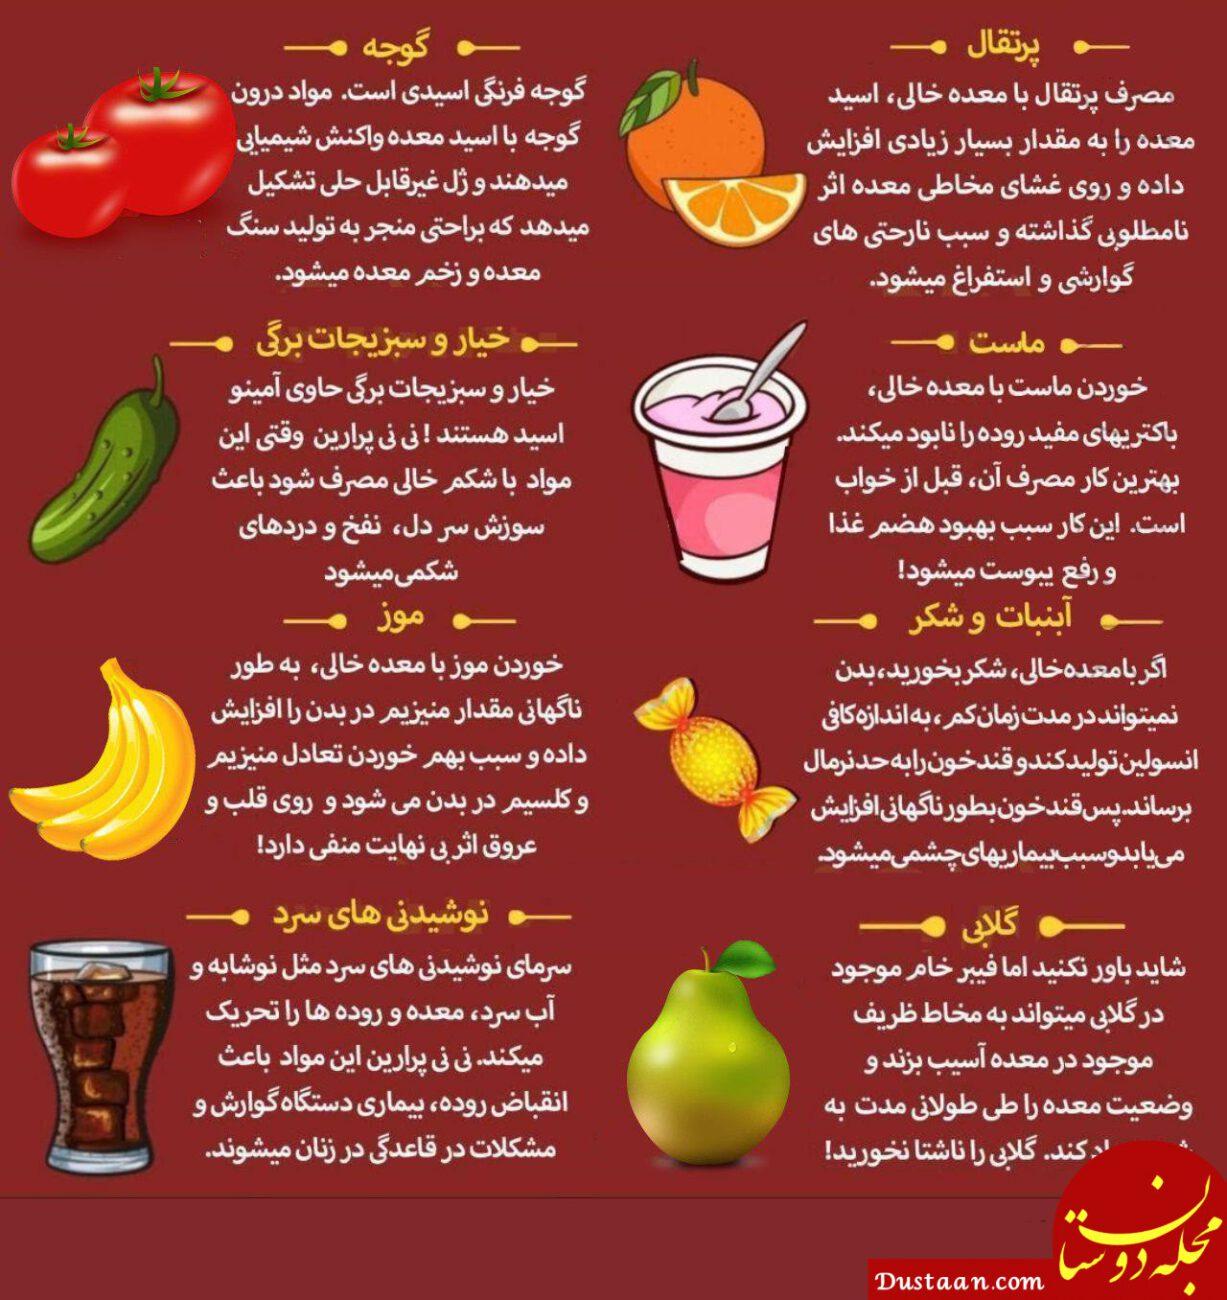 www.dustaan.com این خوراکی ها را با معده خالی نخورید!